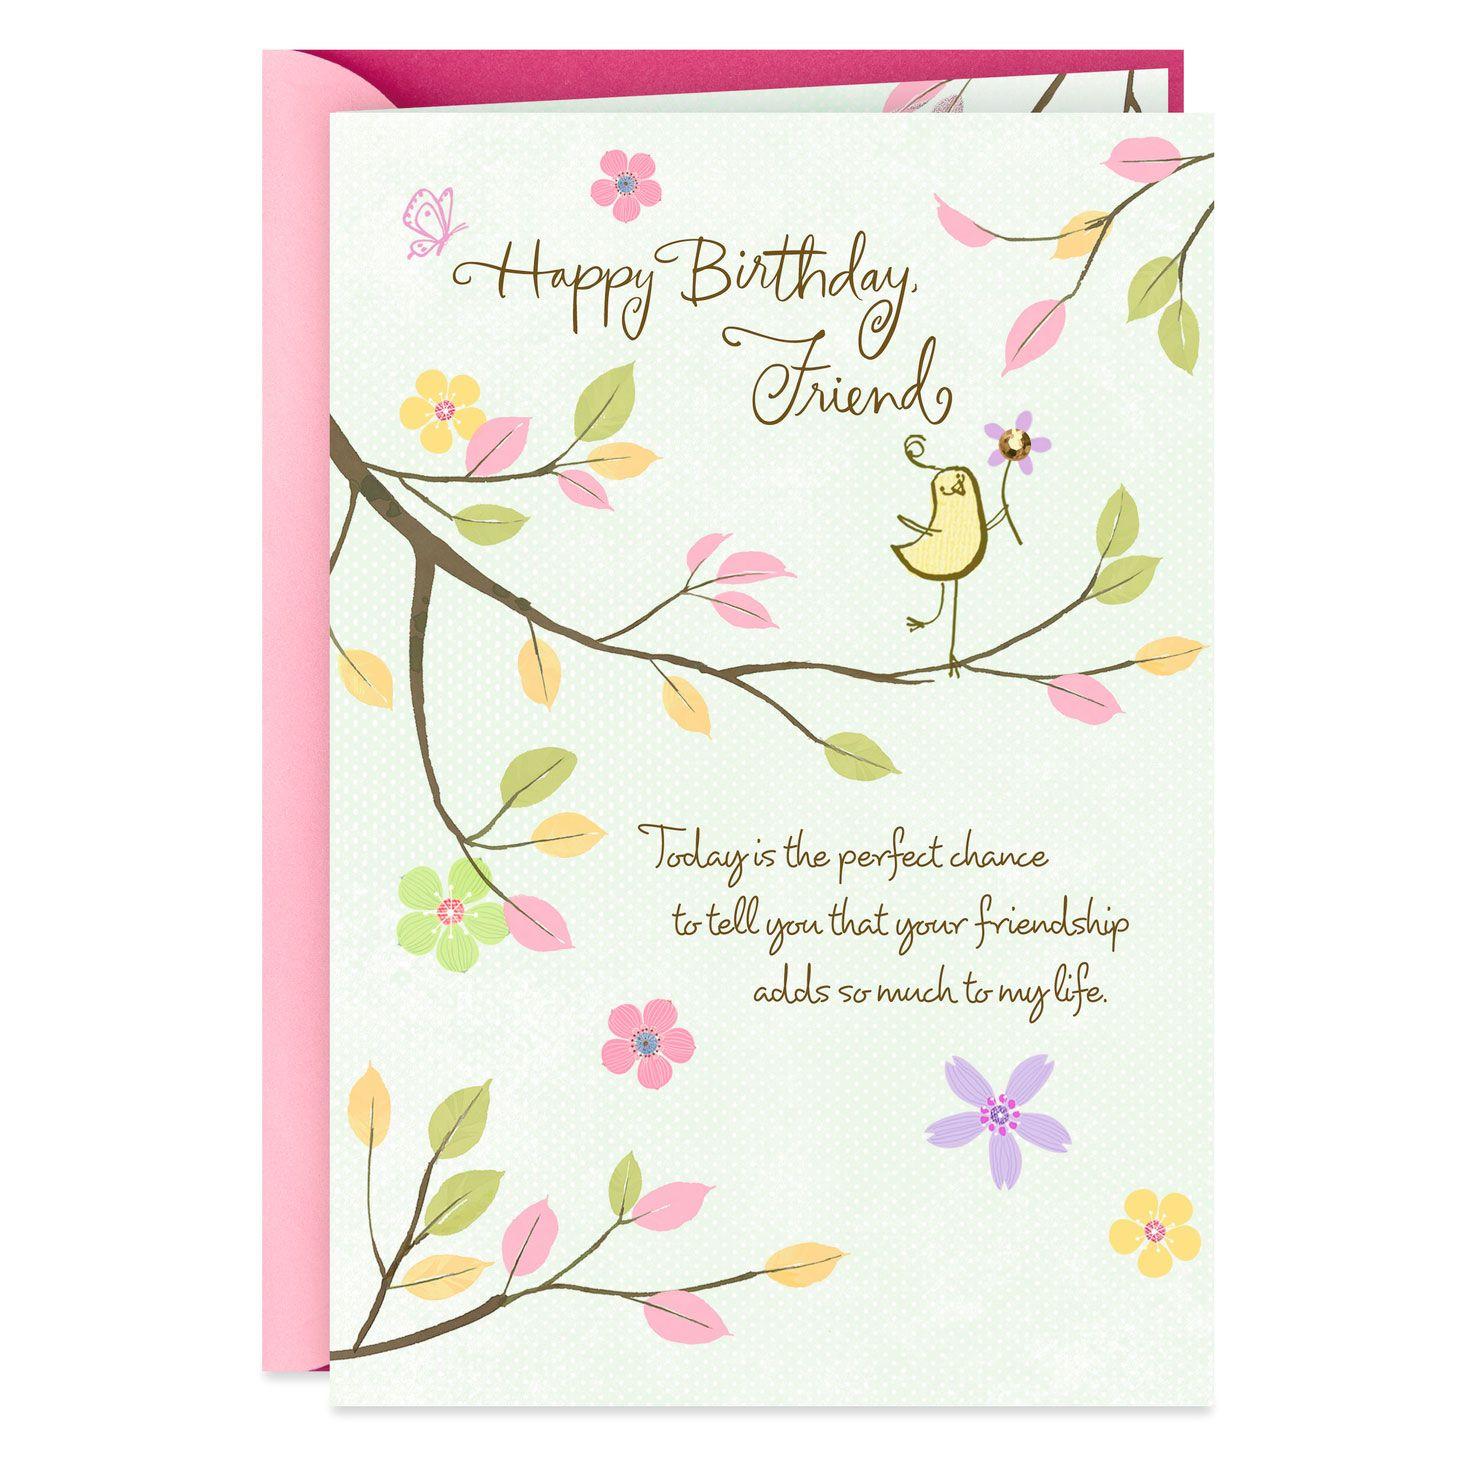 Thankful Friend Birthday Wishes Card in 2020 Happy